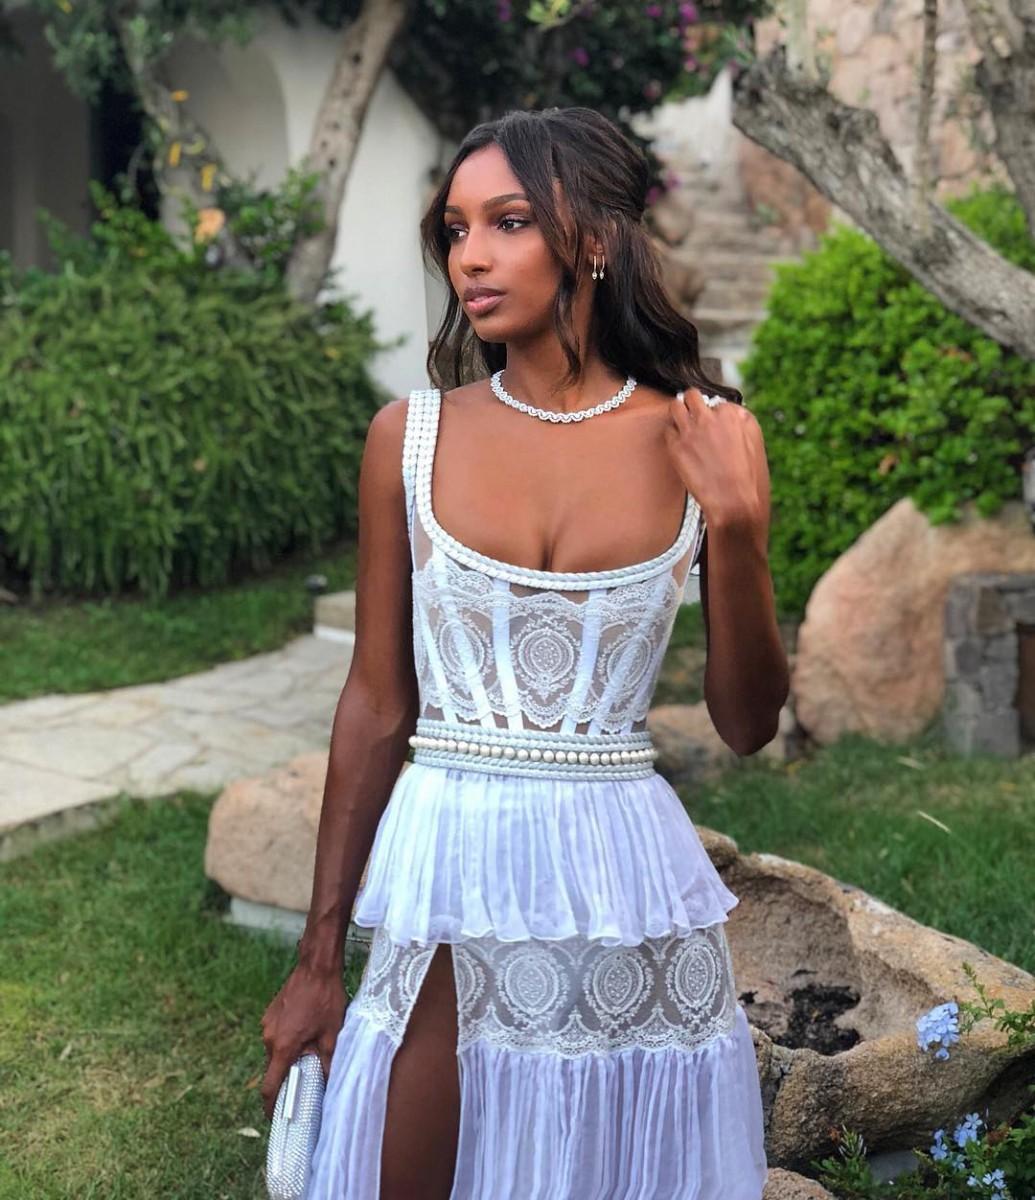 11 фото модели с необычной красотой Jasmine Tookes